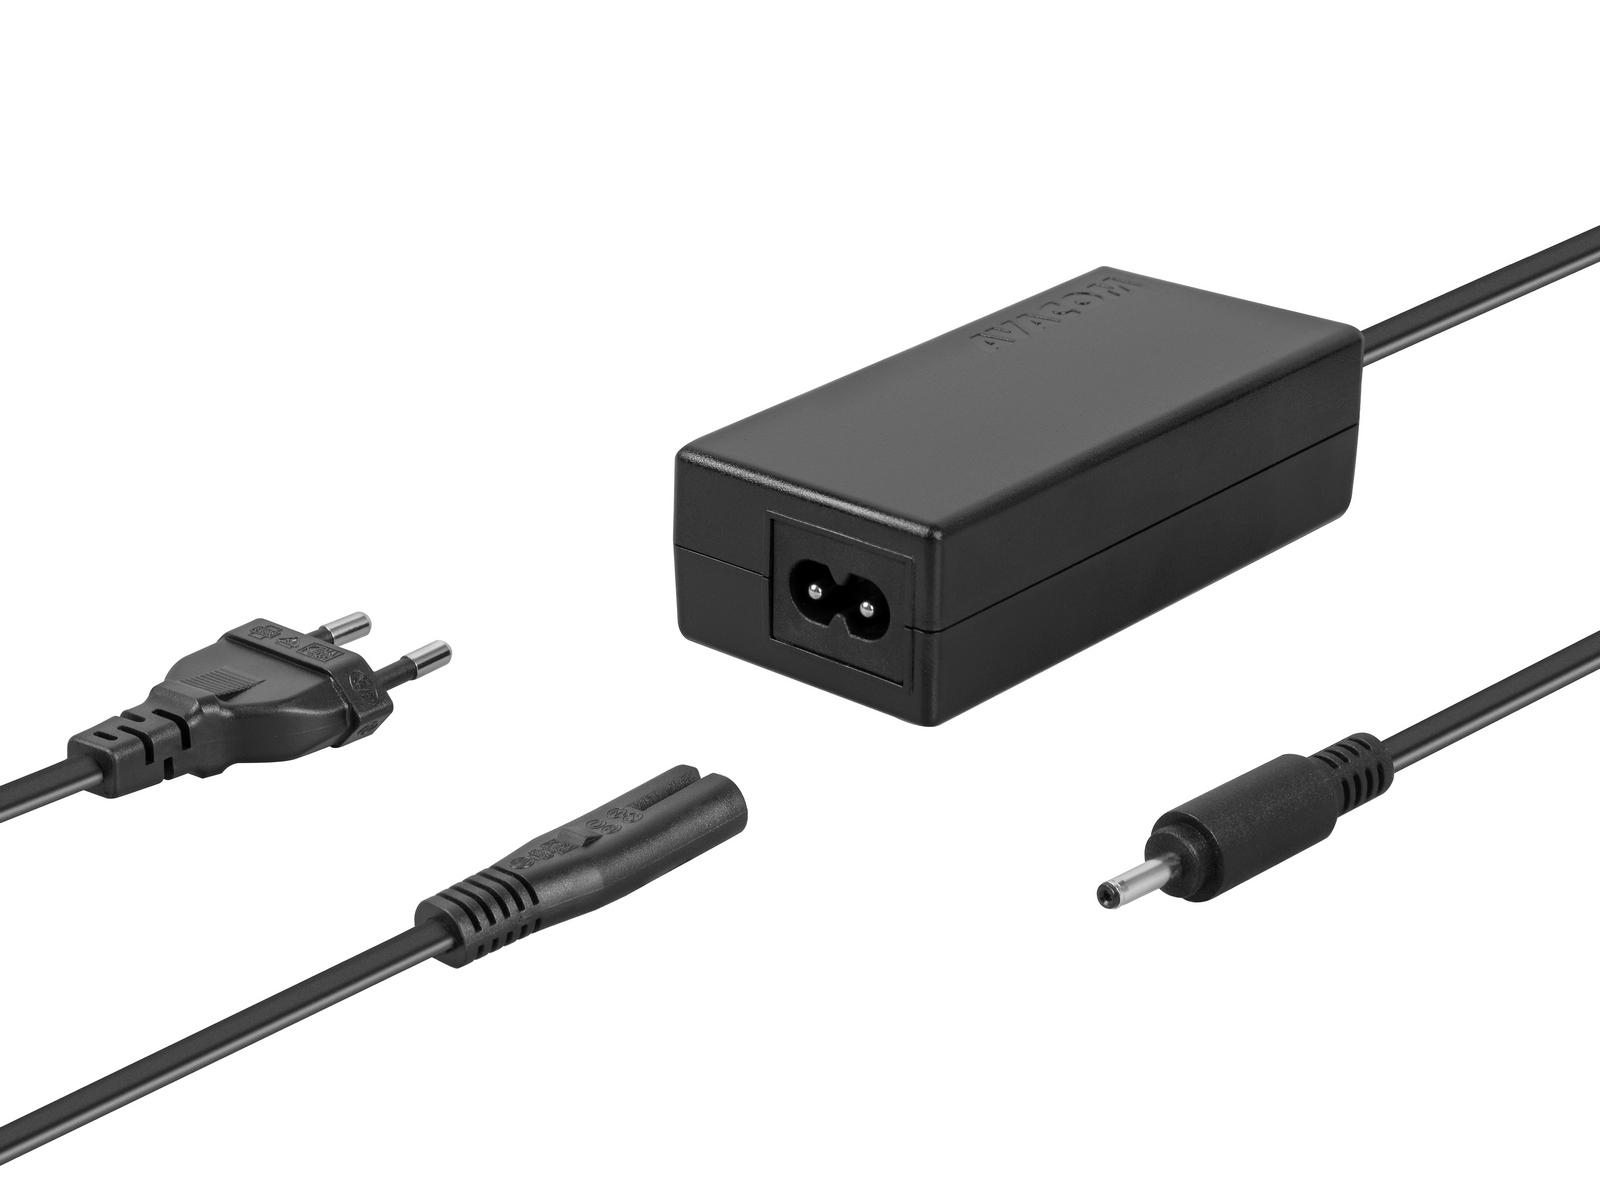 AVACOM nabíjecí adaptér pro notebooky Asus ZenBook 19V 2,37A 45W konektor 3,0mm x 1,0mm, ADAC-AS4-A4